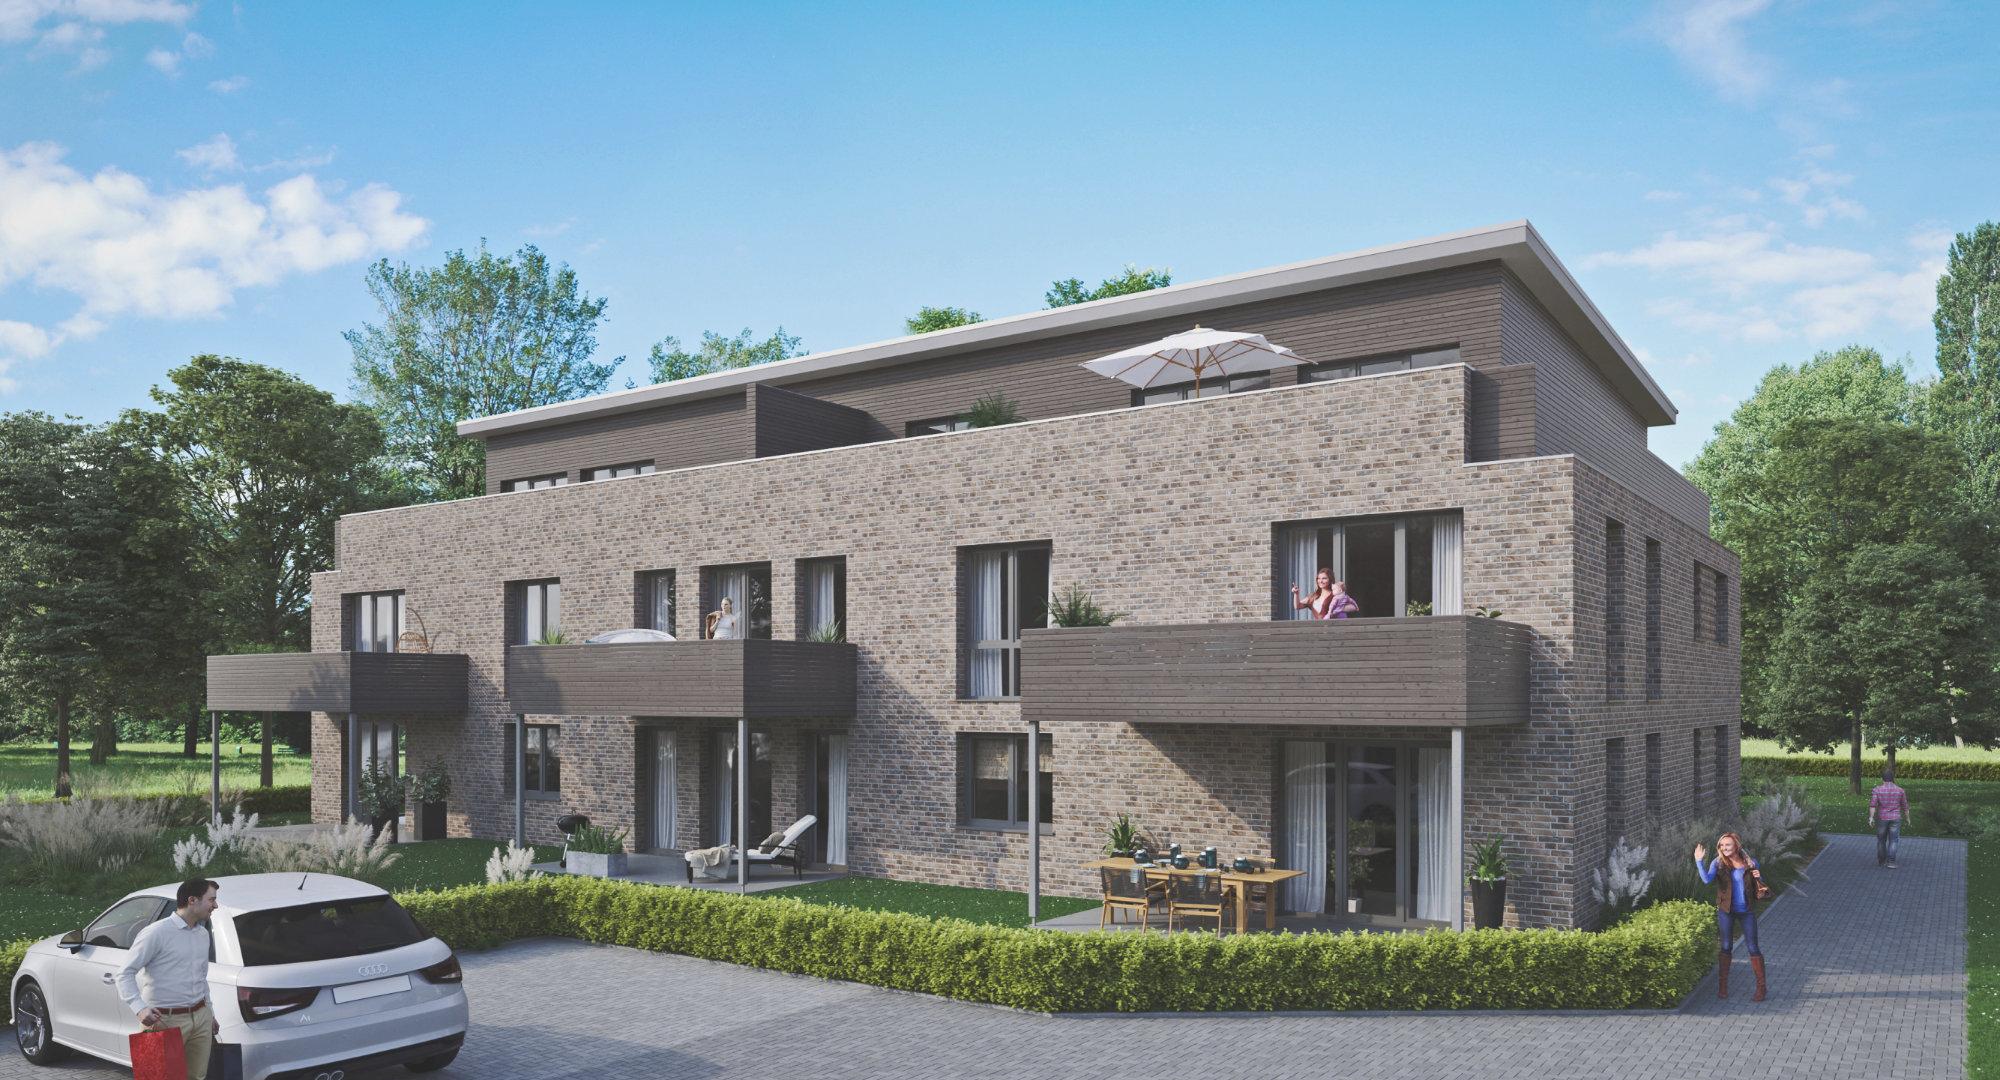 BV_Birkenallee-Garten-A4v2-48